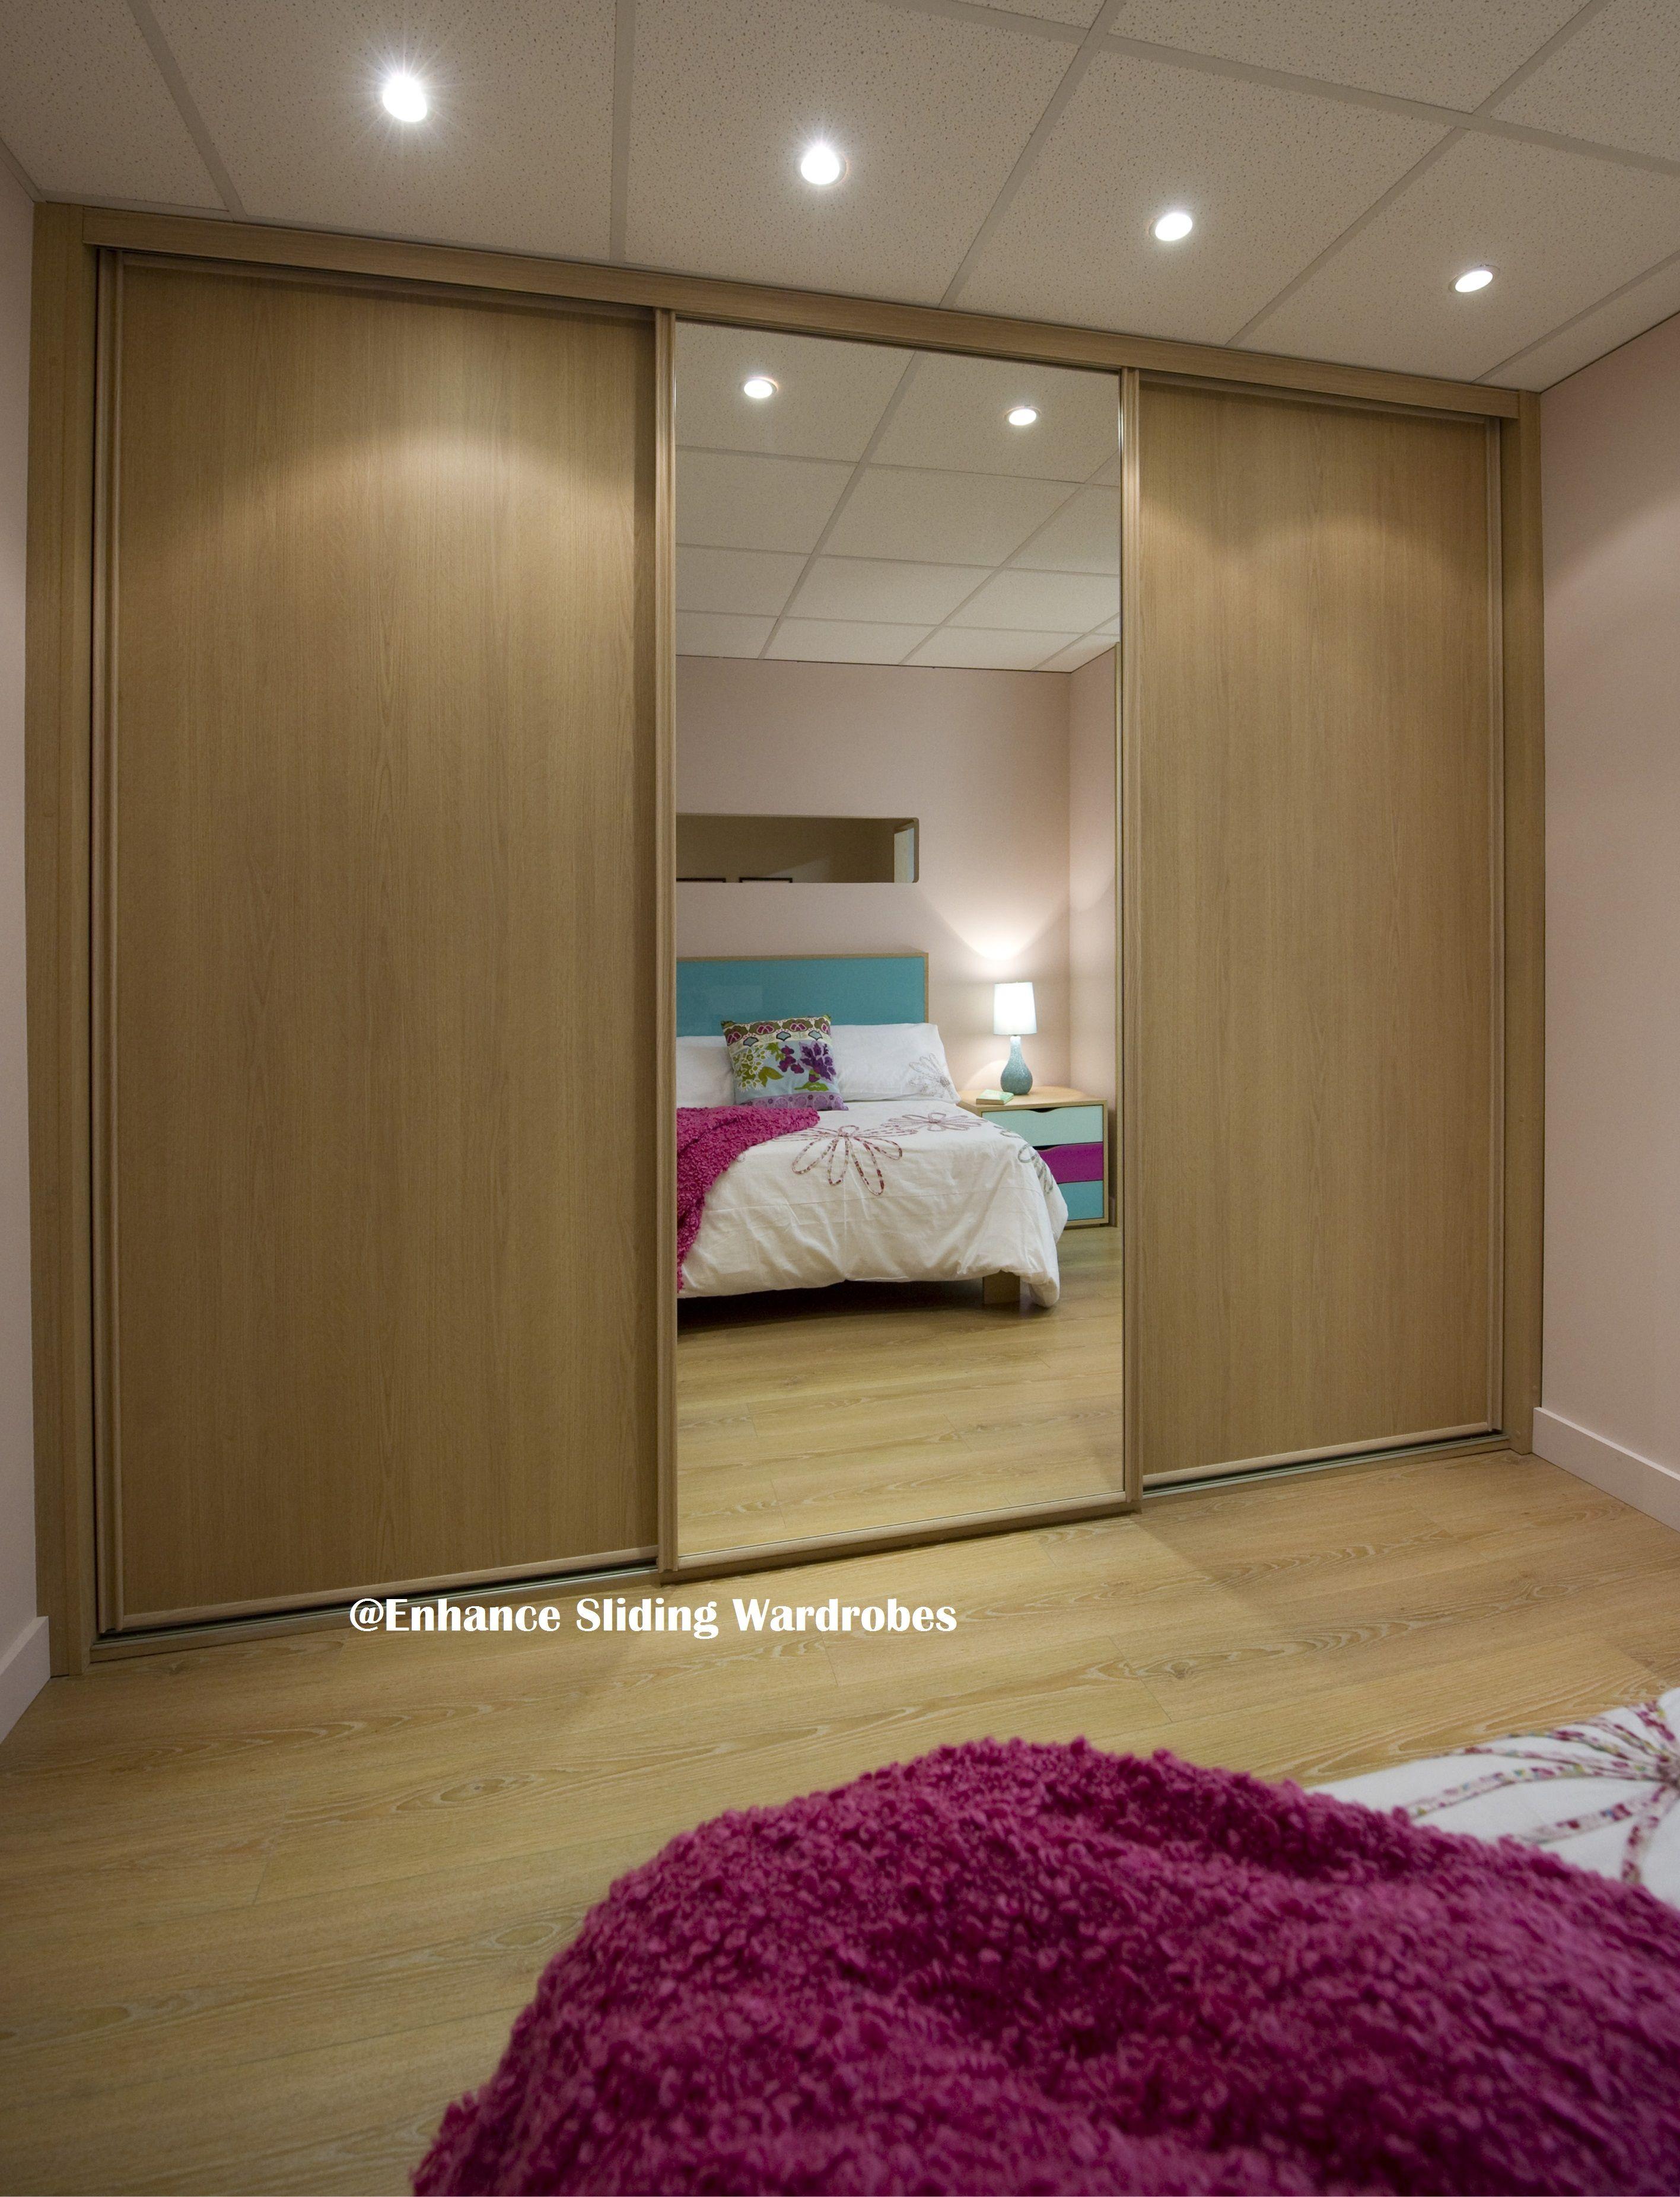 Enhance Sliding Wardrobes Wardrobe Design Bedroom Wardrobe Door Designs Bedroom Wardrobe